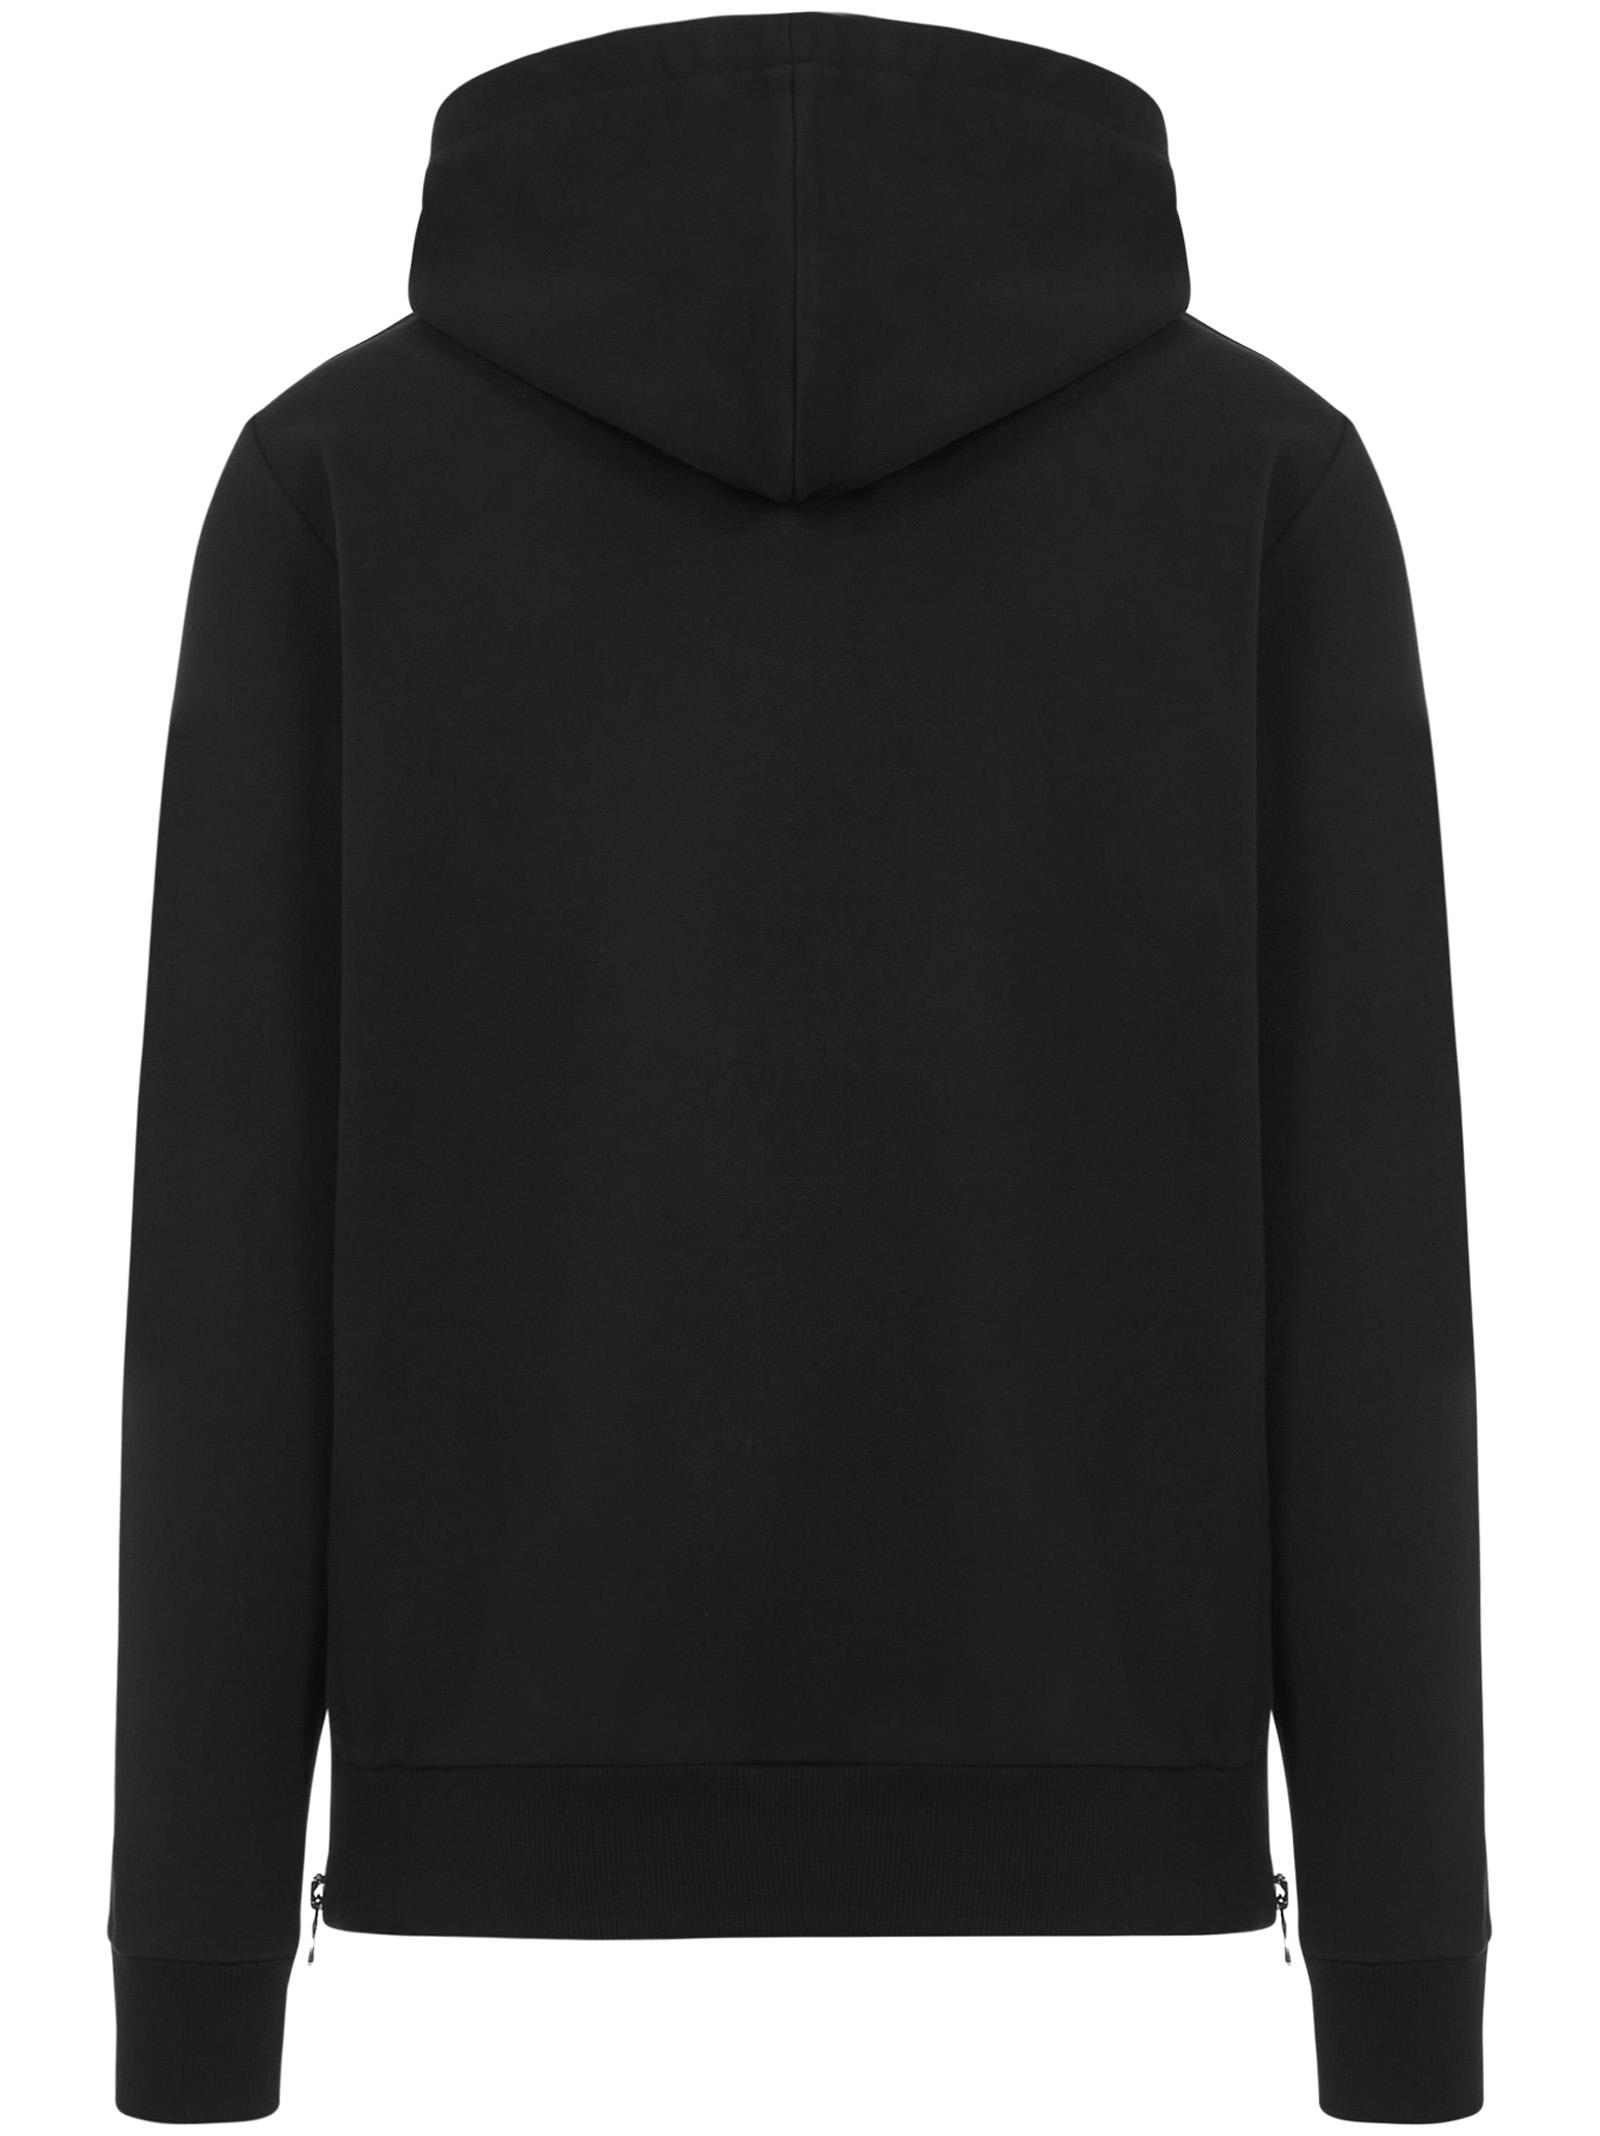 Balmain Paris sweatshirt Balmain Paris | -108764232 | UH03642I3350PA